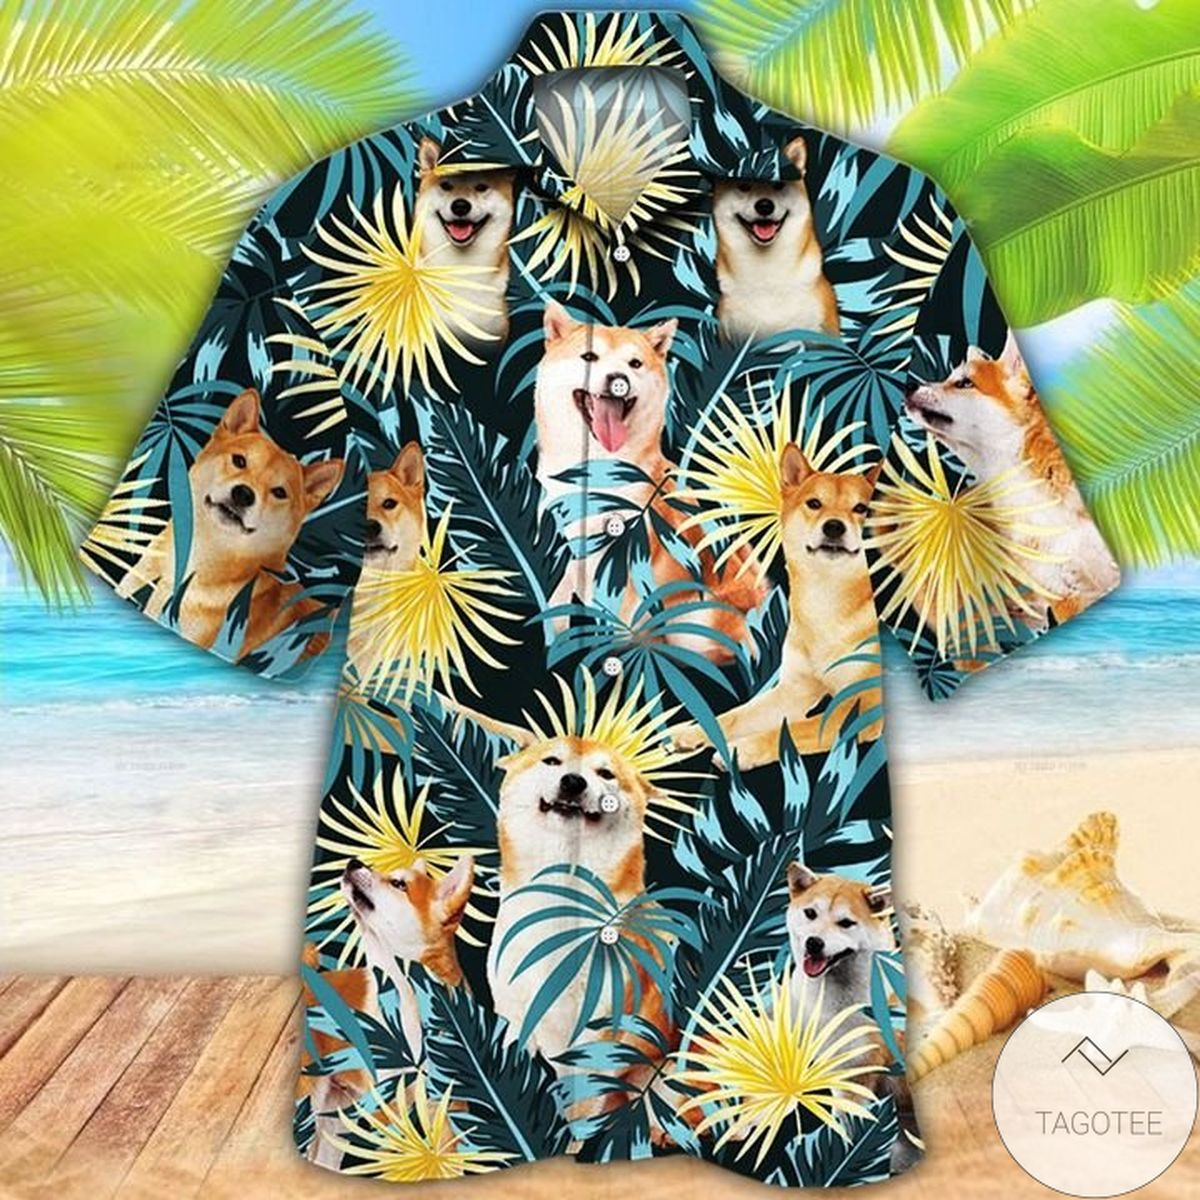 Handmade Shiba Inu Dog Lovers Blue And Yellow Plants Hawaiian Shirt